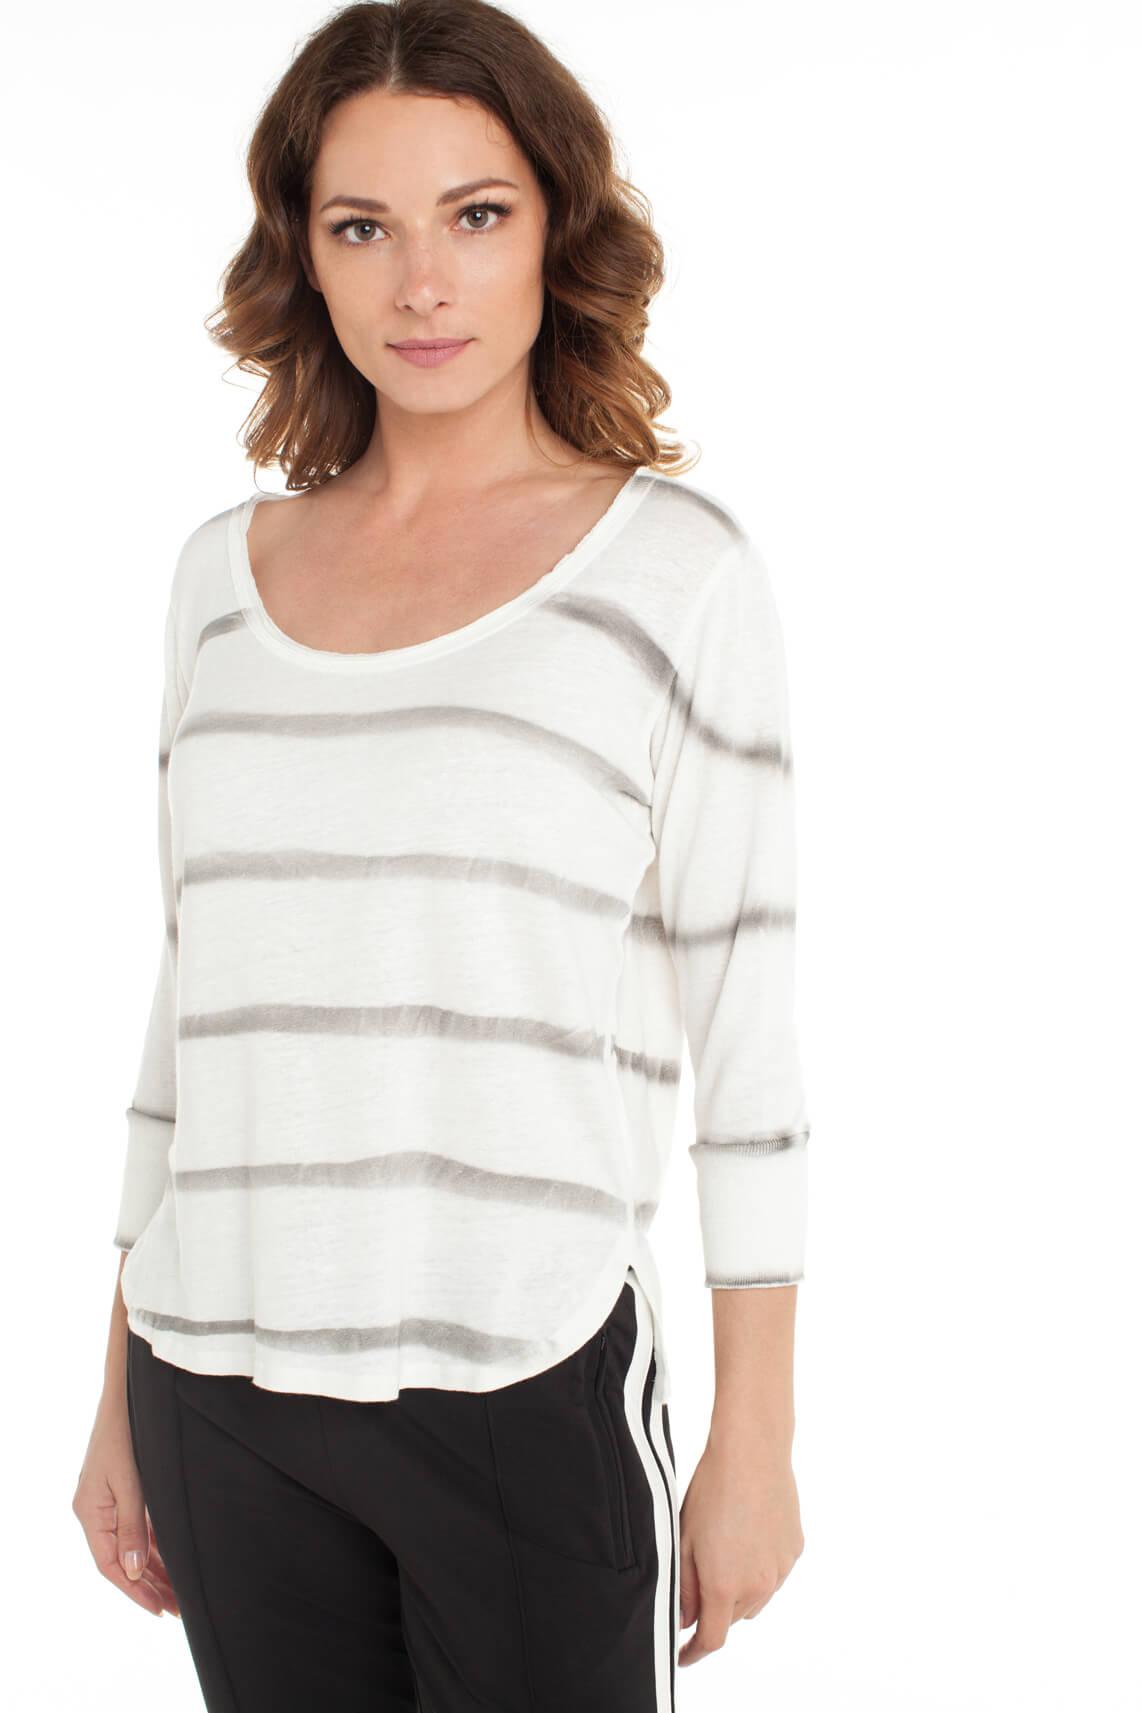 10 Days Dames Shirt met garment dye strepen wit